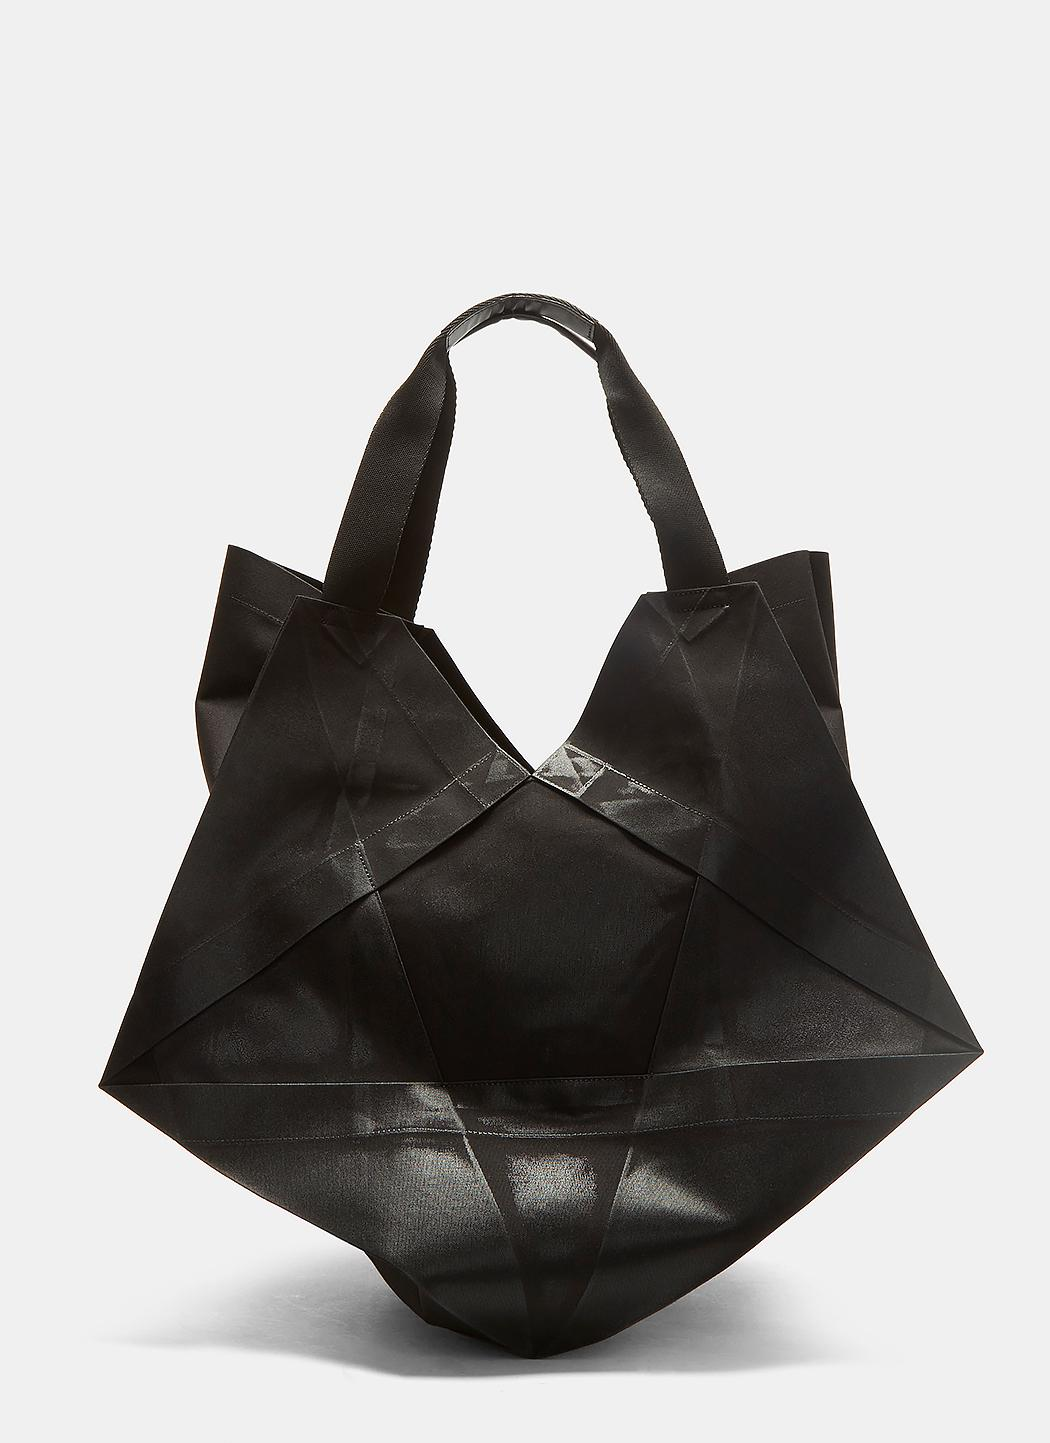 132 5. Issey Miyake Synthetic Standard 4 Origami Tote Bag In Black